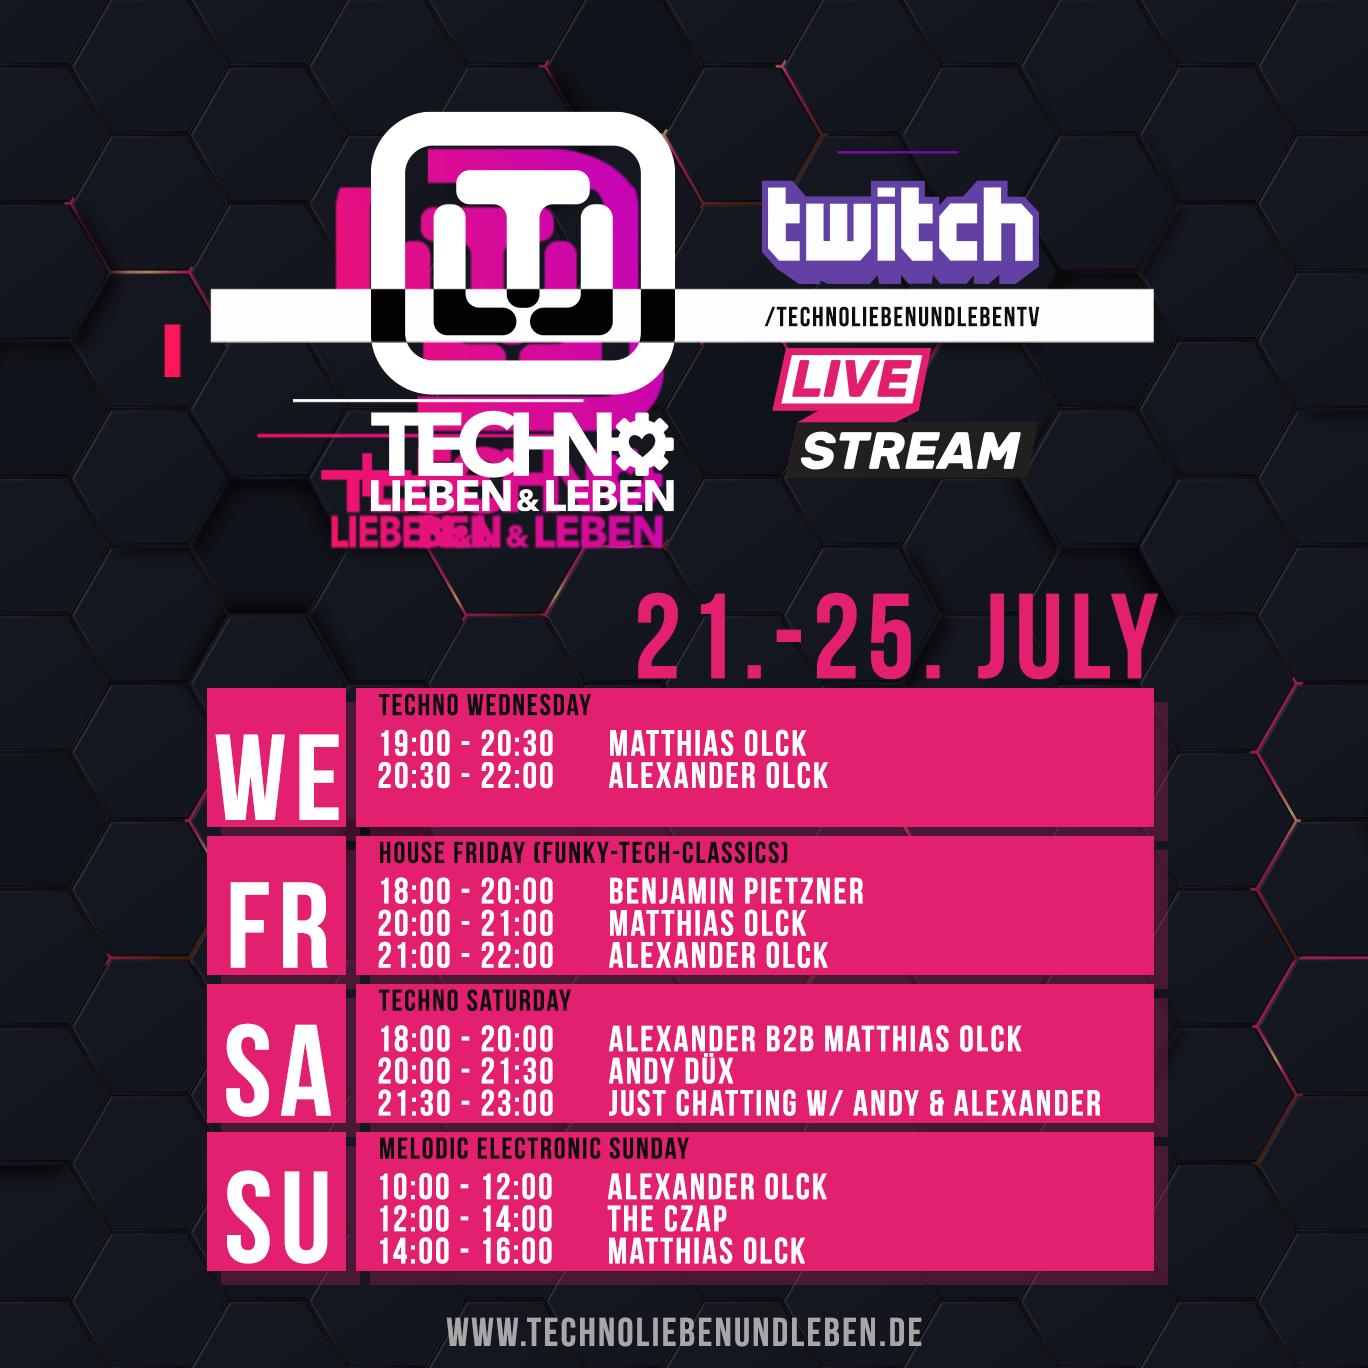 21. - 25. July Twitch Livestream